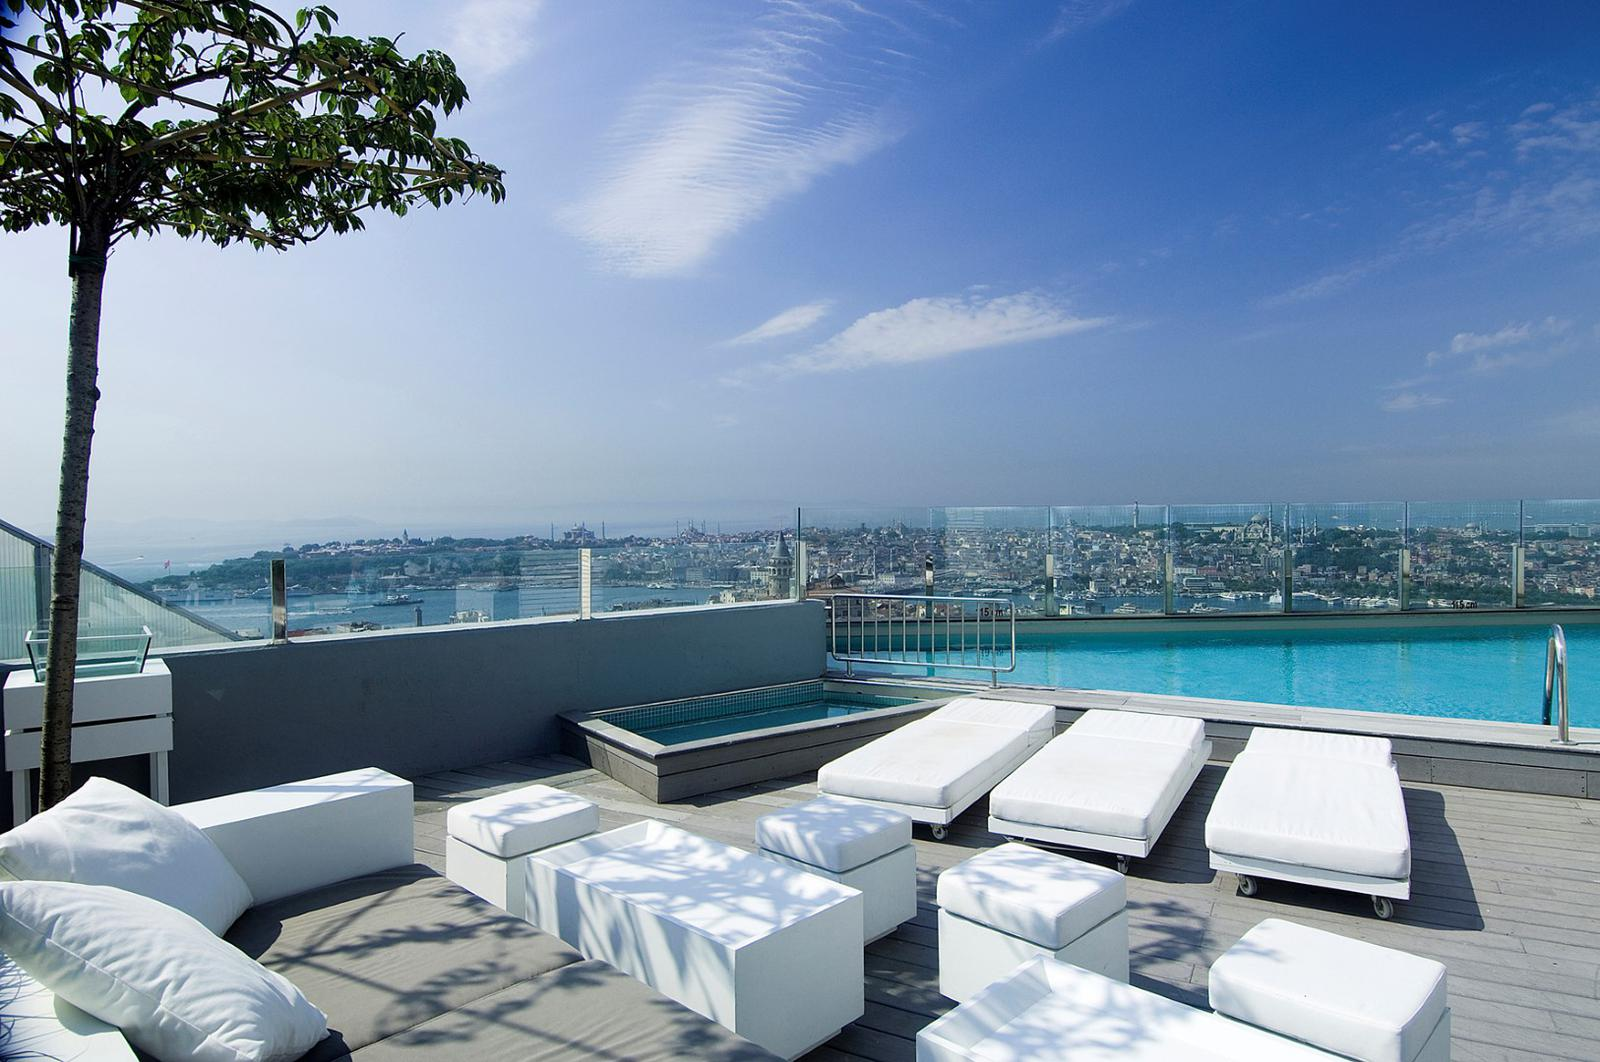 mejores terrazas de hoteles The Marmara Pera